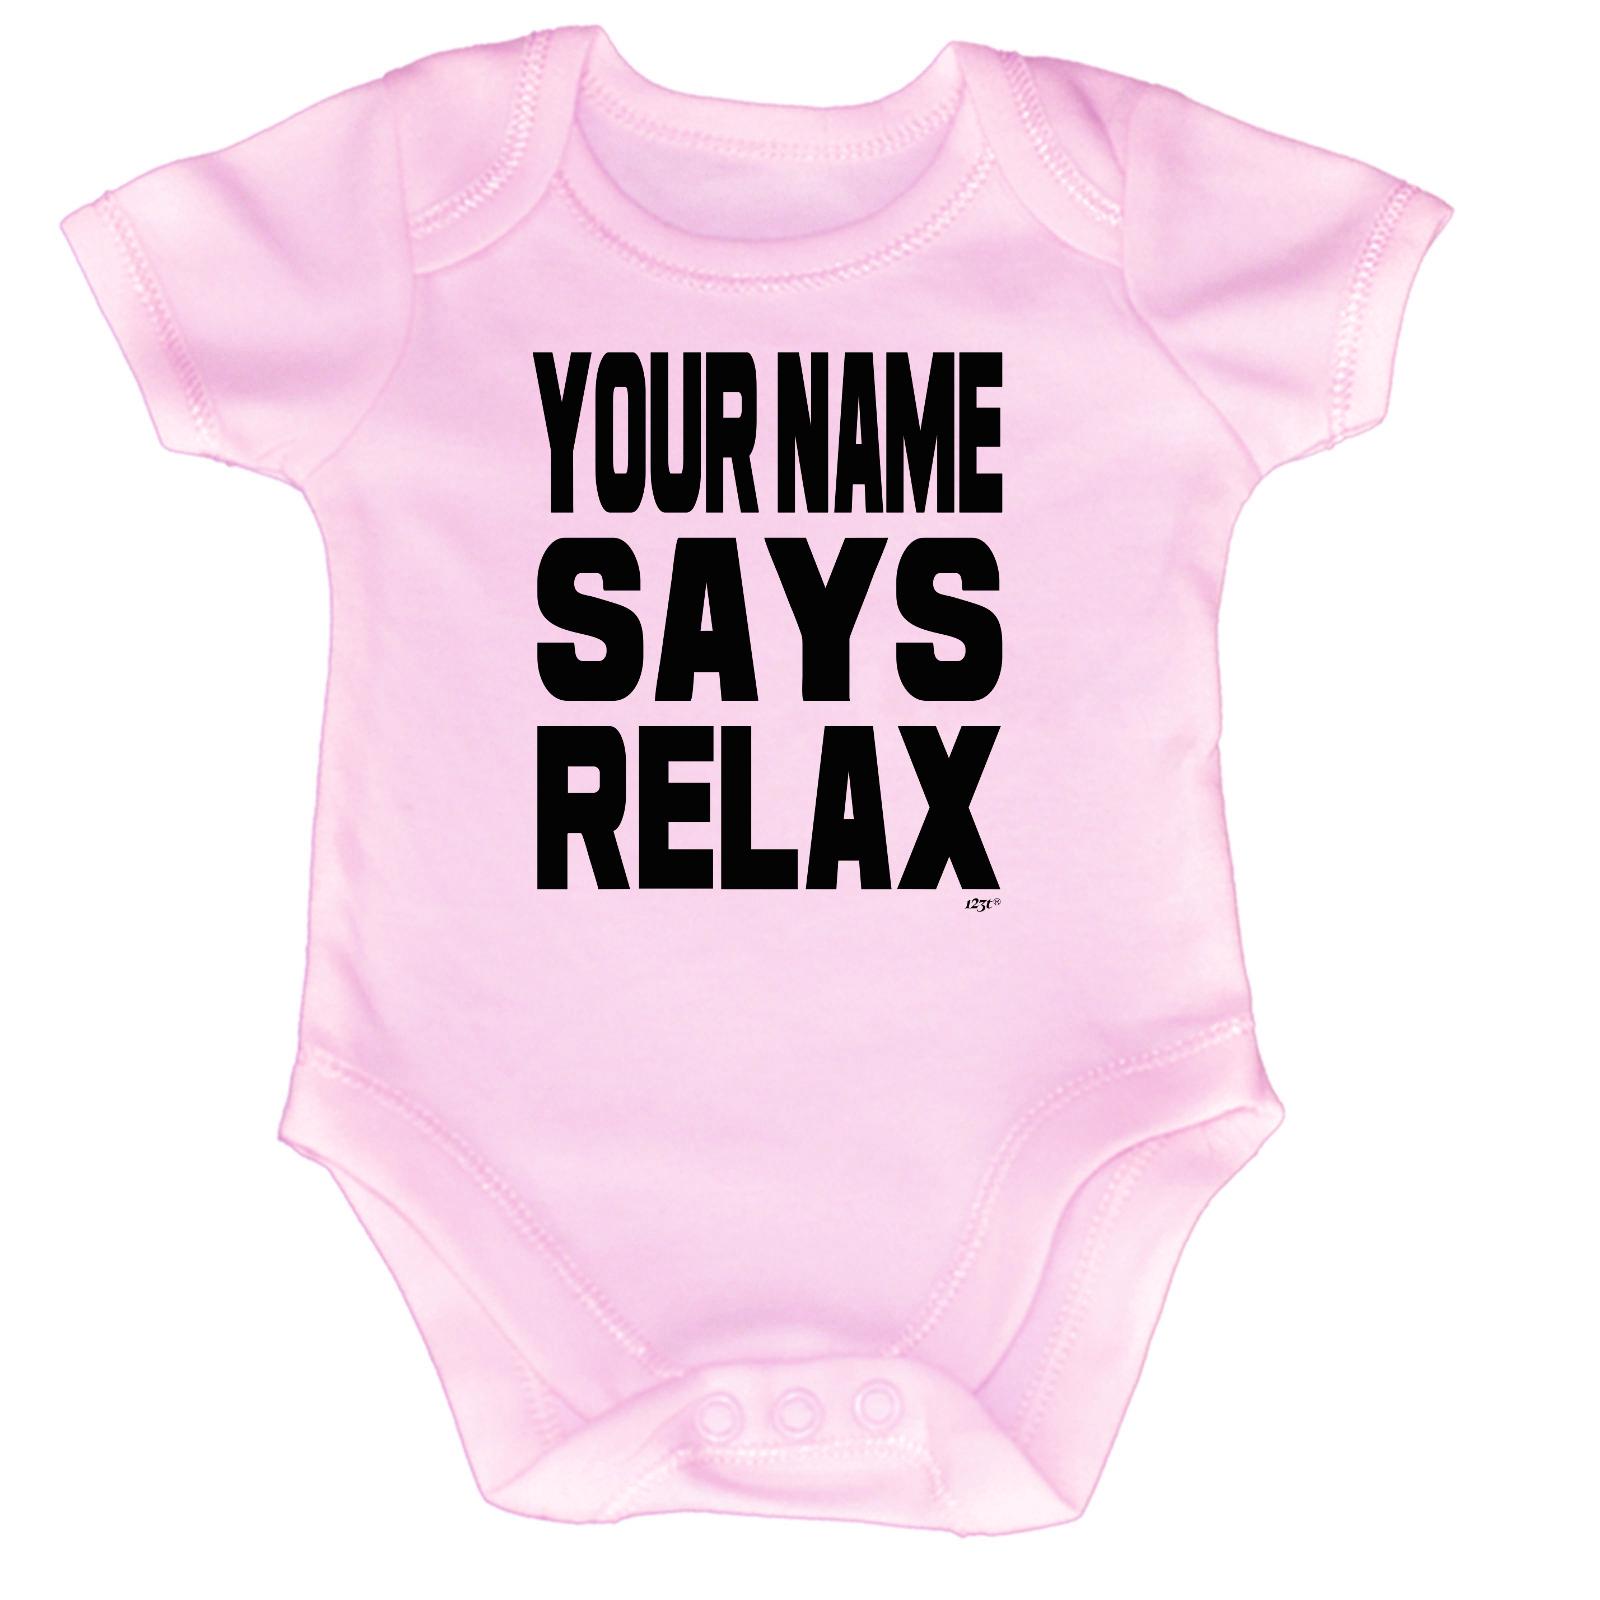 Funny Baby Babies Babygrow Jumpsuit Romper Pajamas SUPER VARIOUS DESIGNS BM0